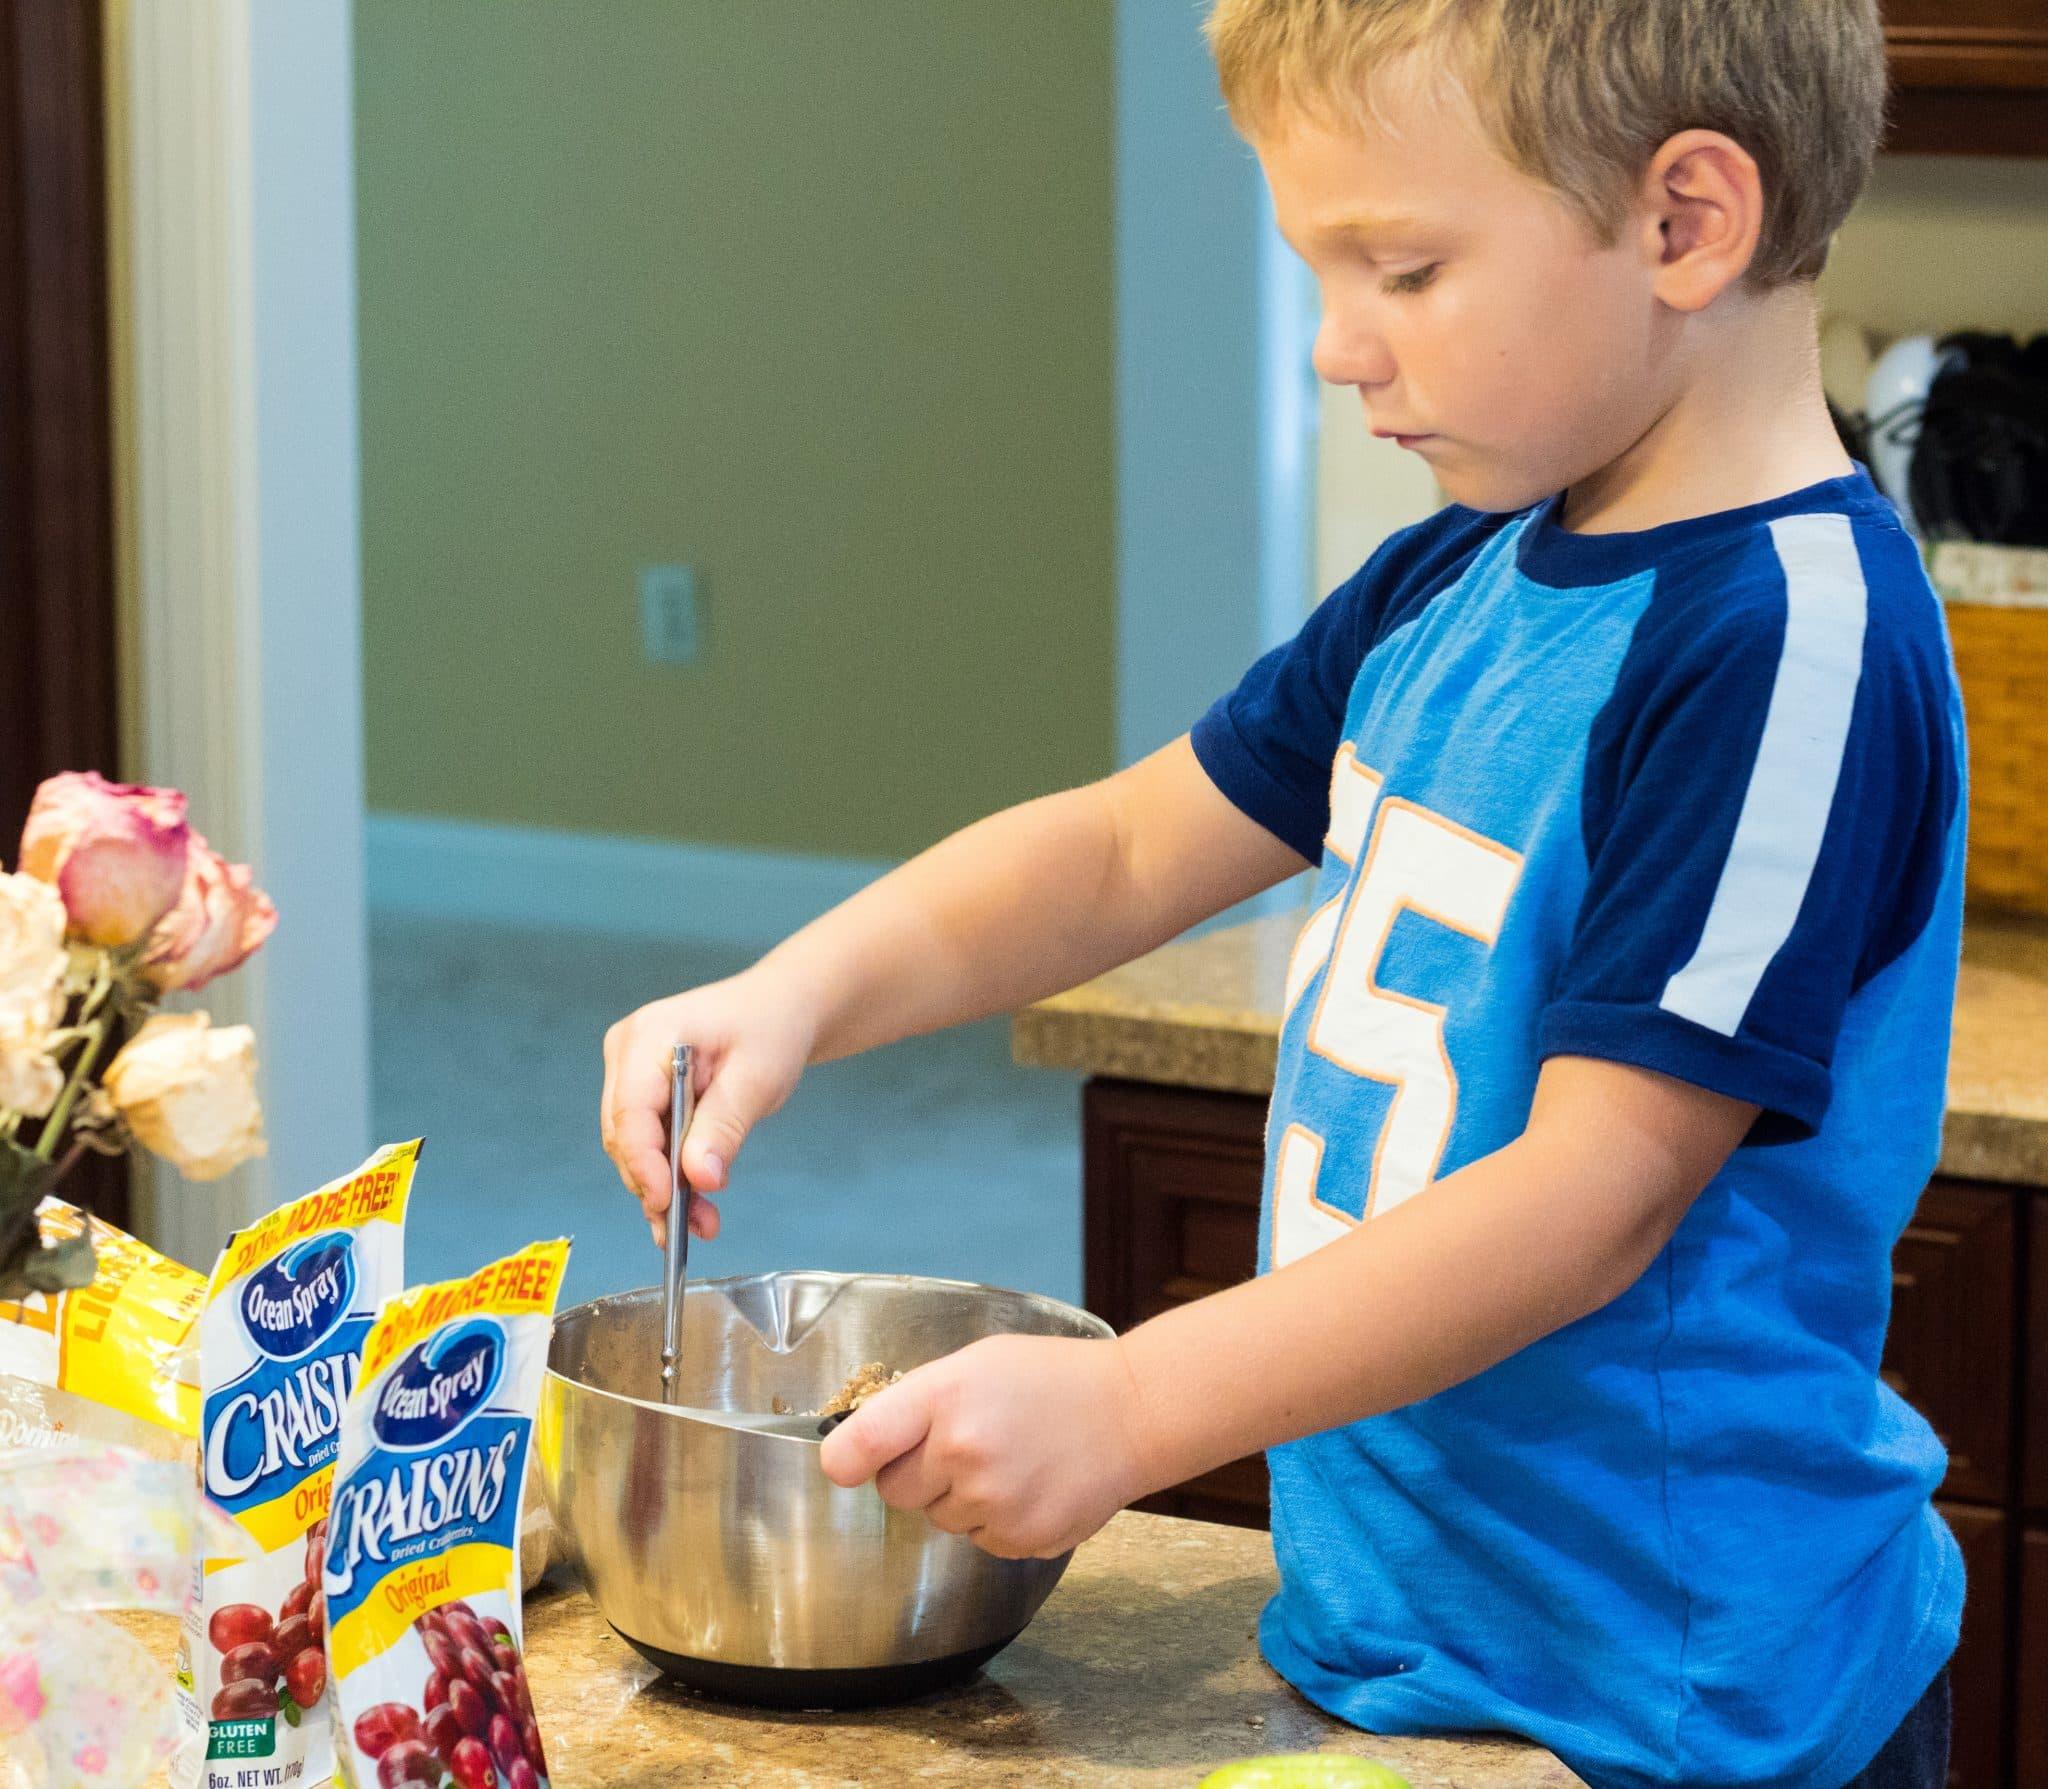 The making of Yummy Easy Apple Craisin Crisp